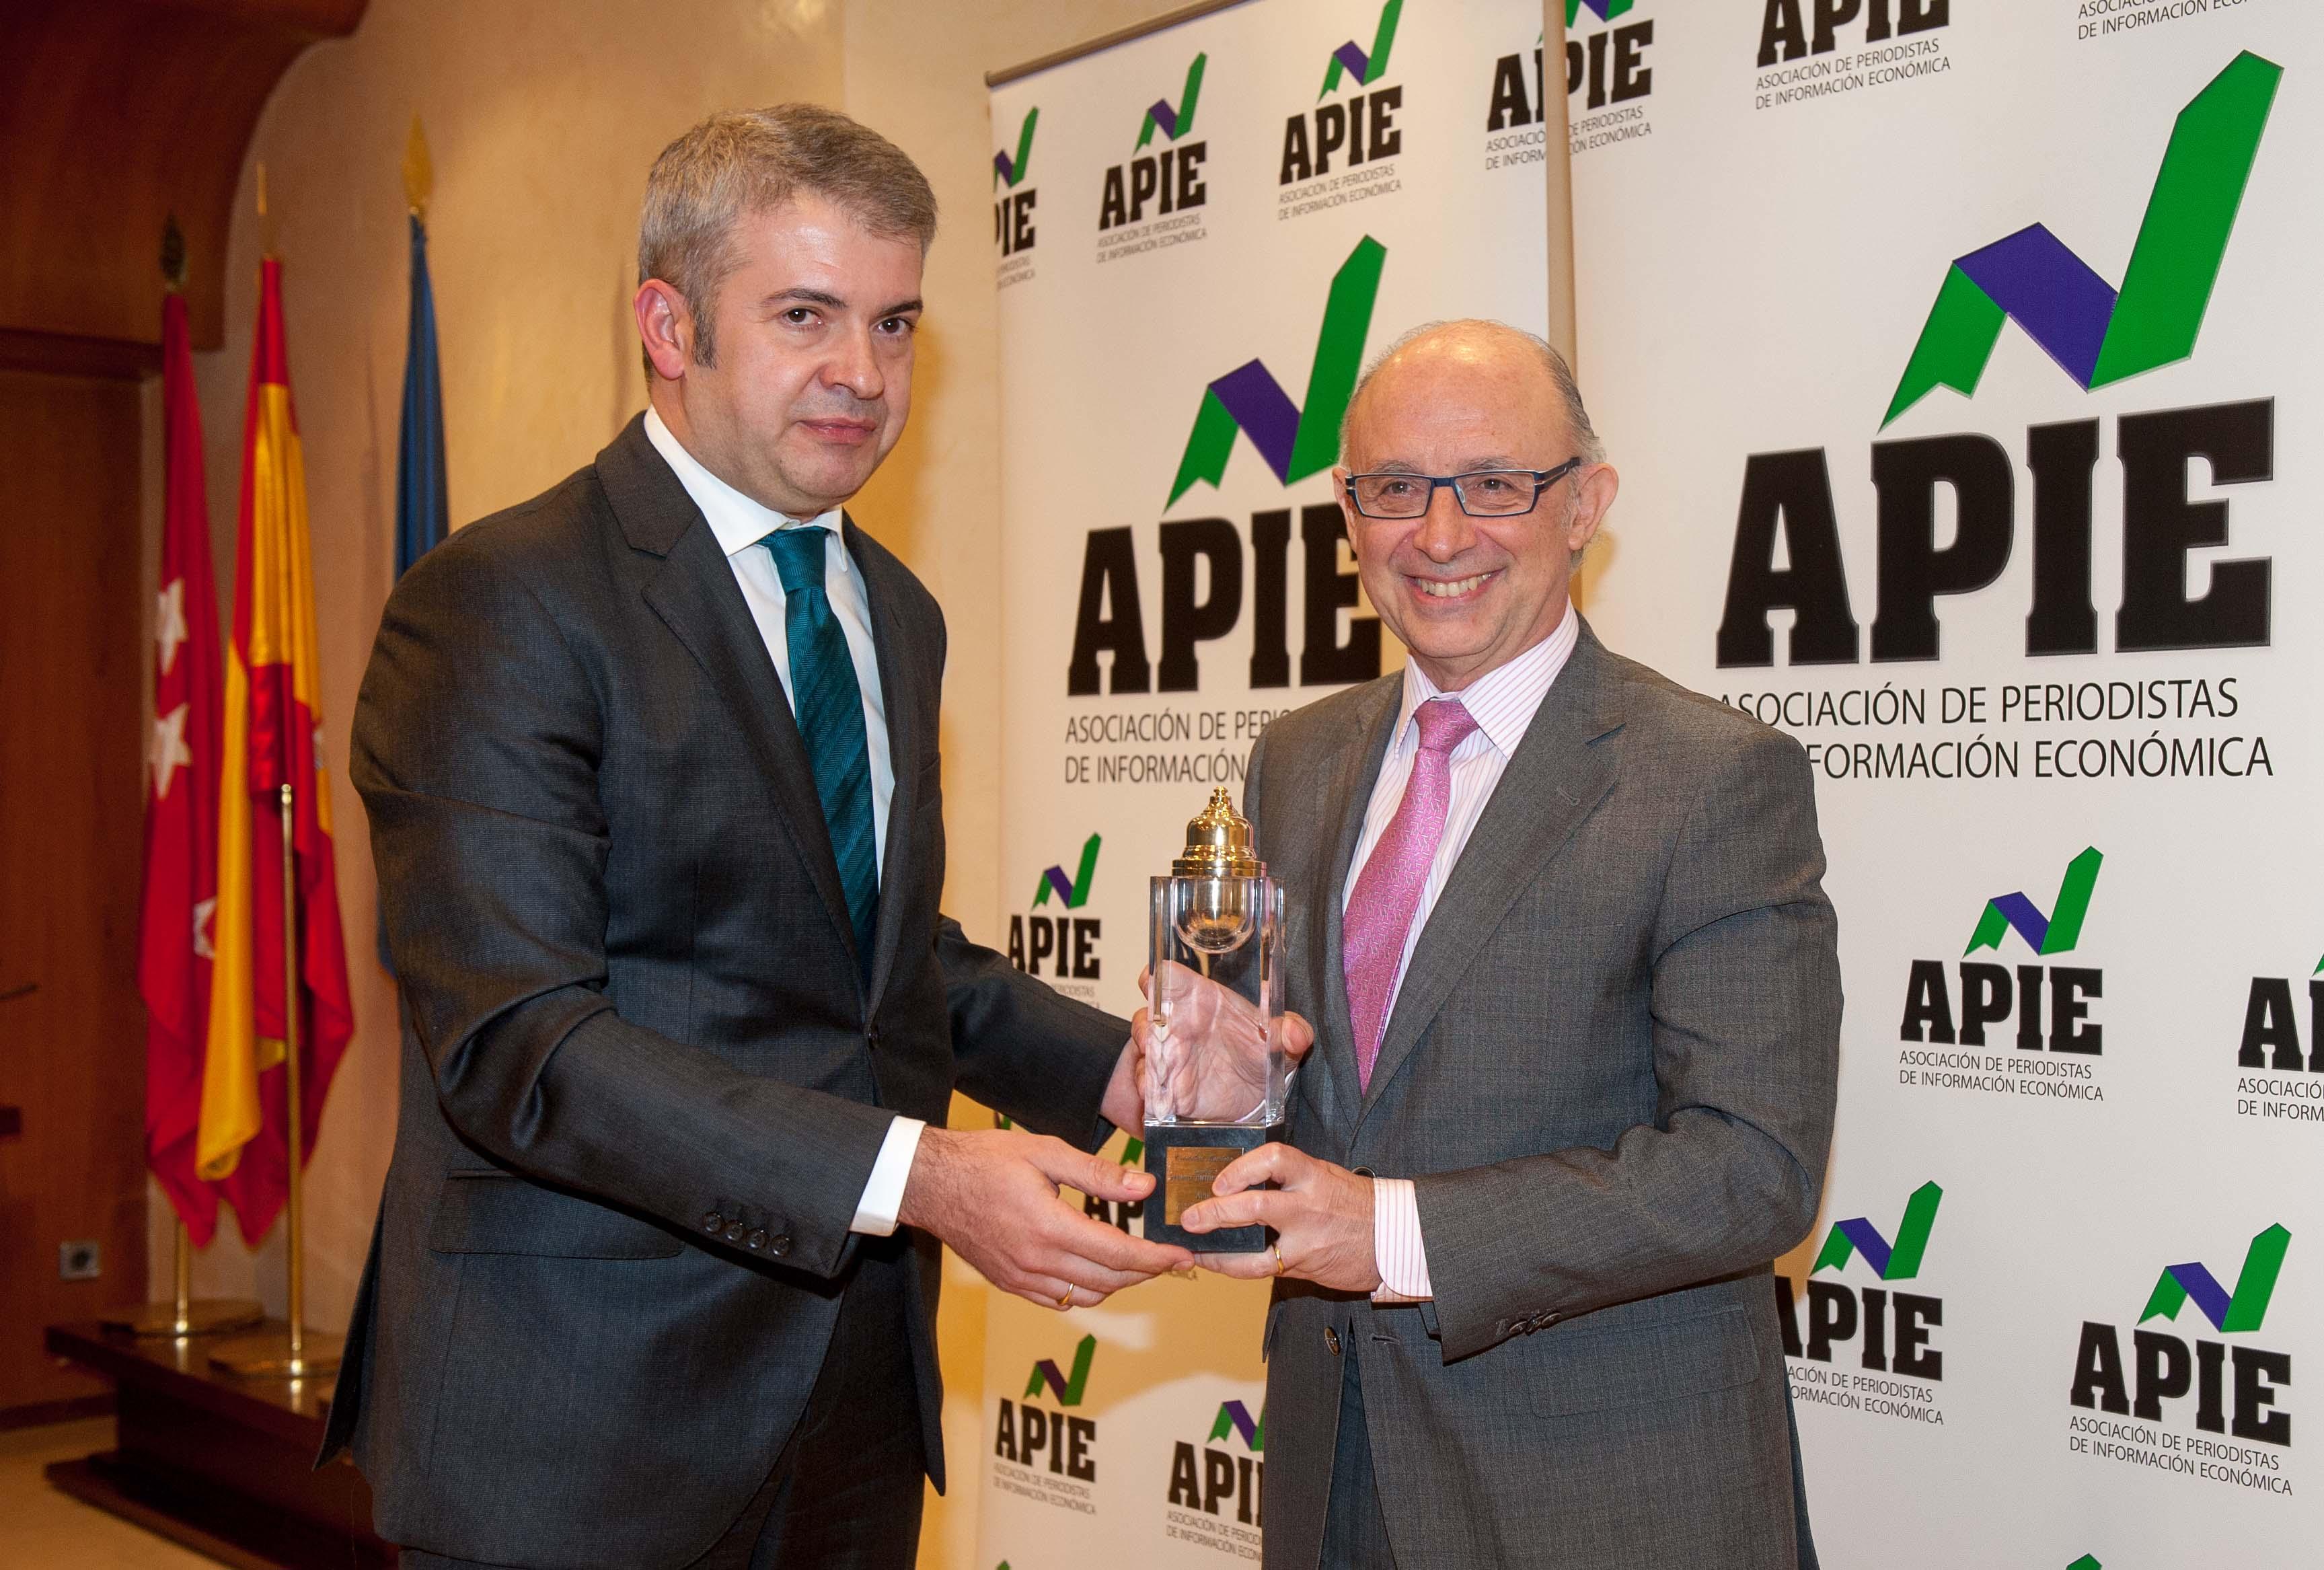 Javier García de la Vega, presidente de APIE, hace entrega del Premio Tintero 2014 al Ministro de Hacienda, Cristóbal Montoro.